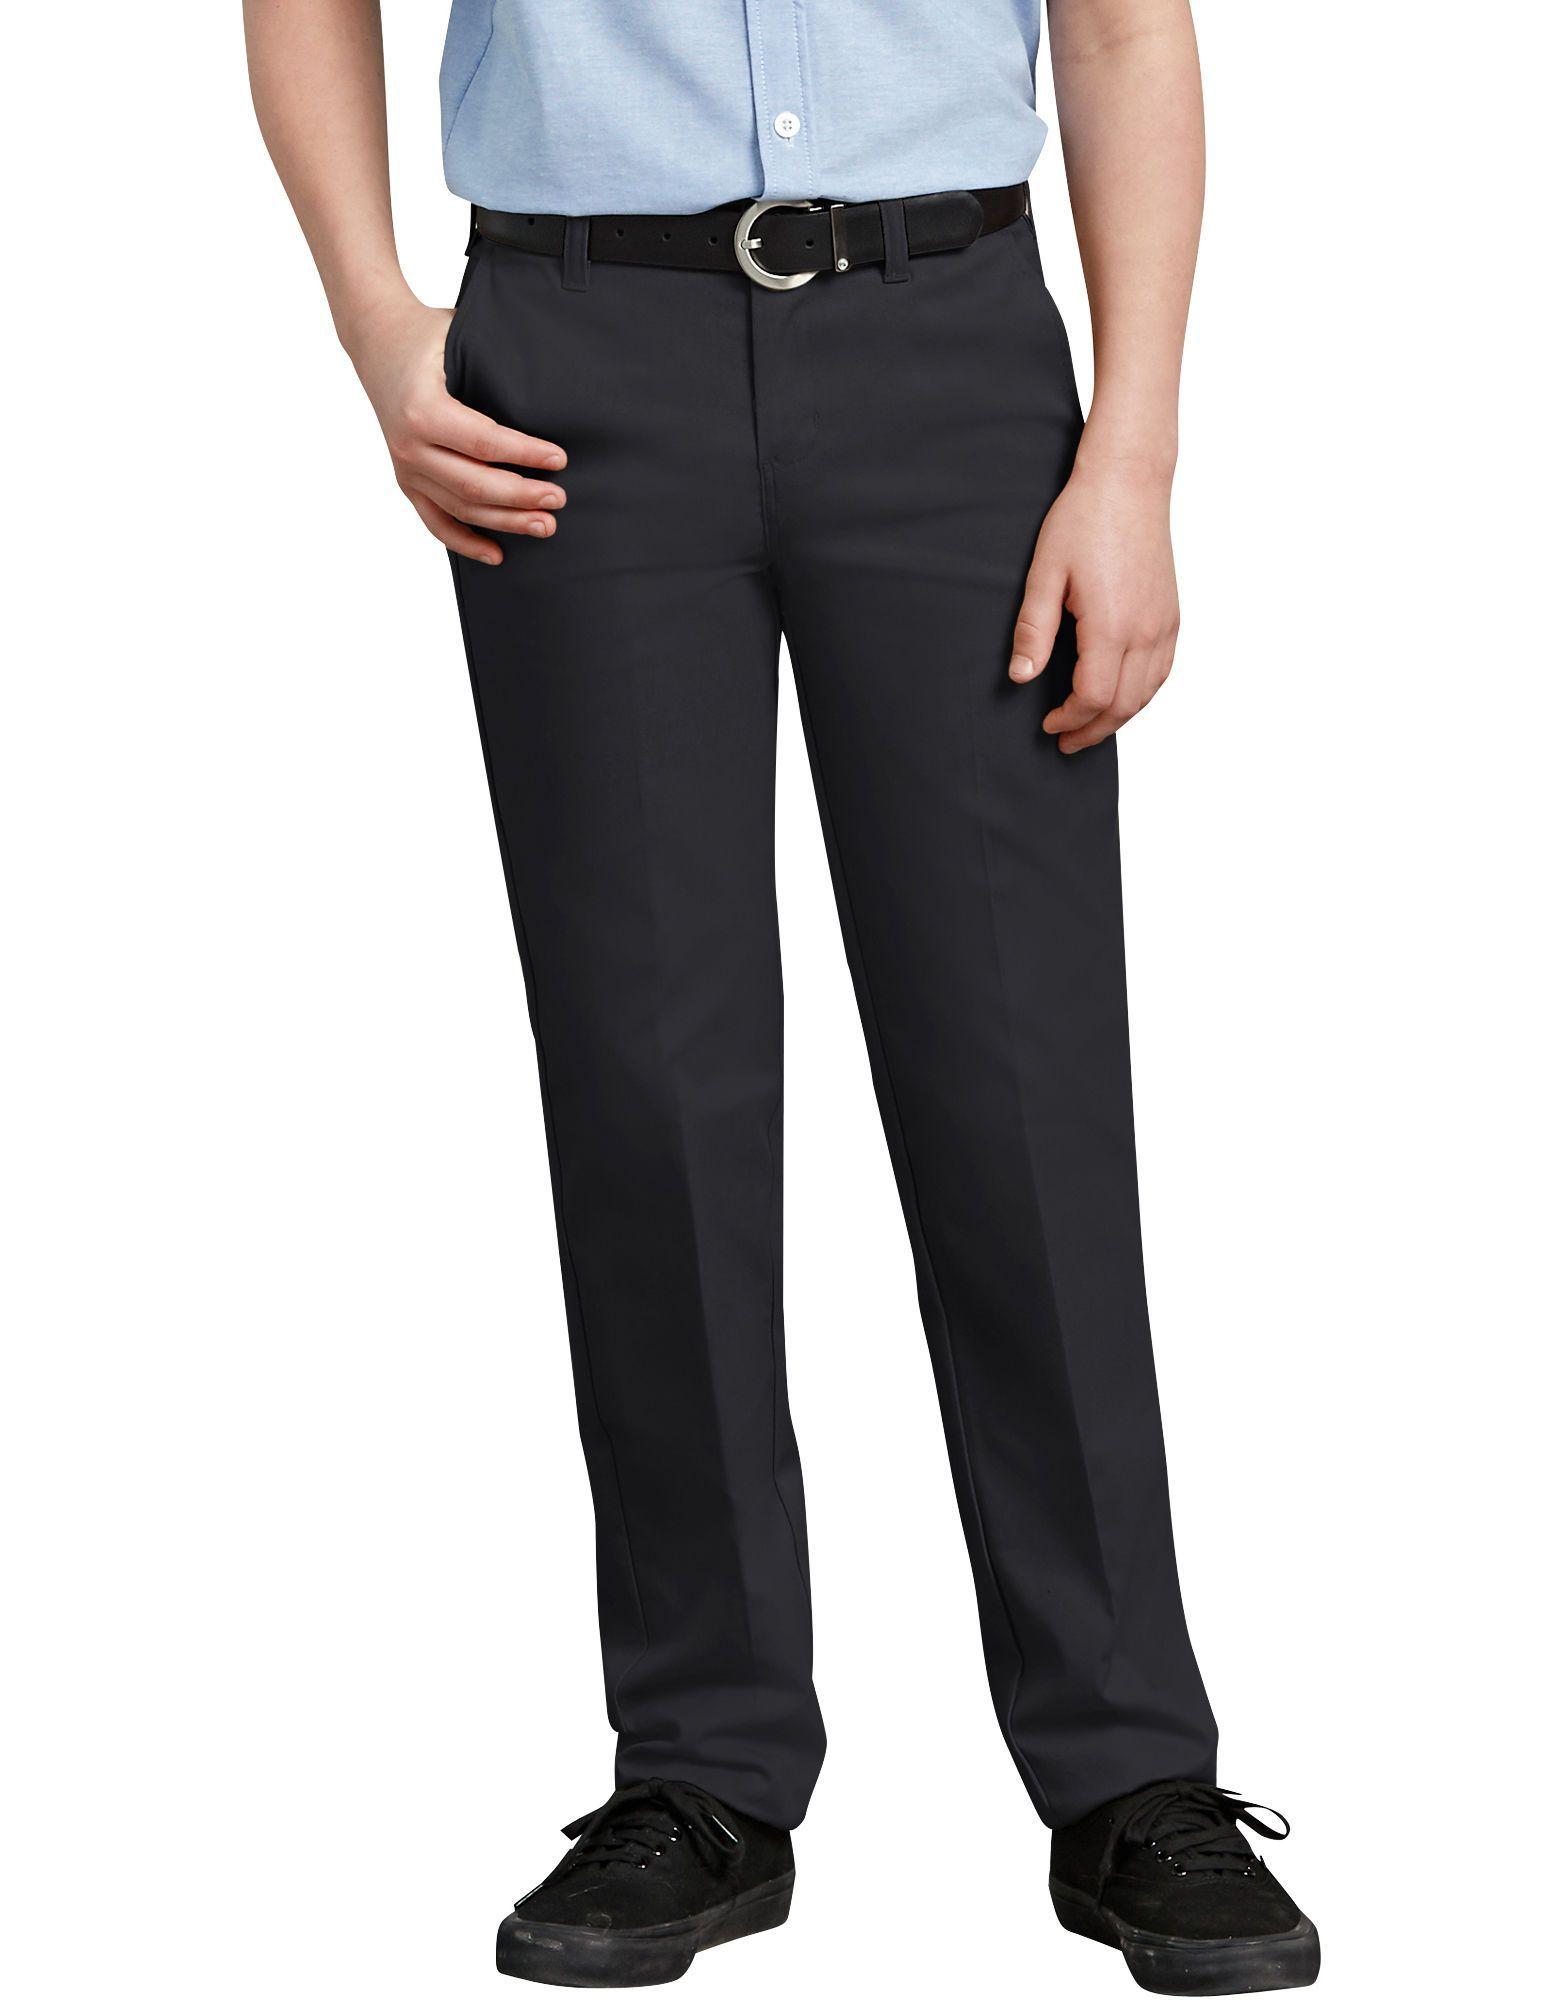 e6e29e3d05c9f Buy Slim Cvc Perf Pant 8-2 - Dickies Online at Best price - PA